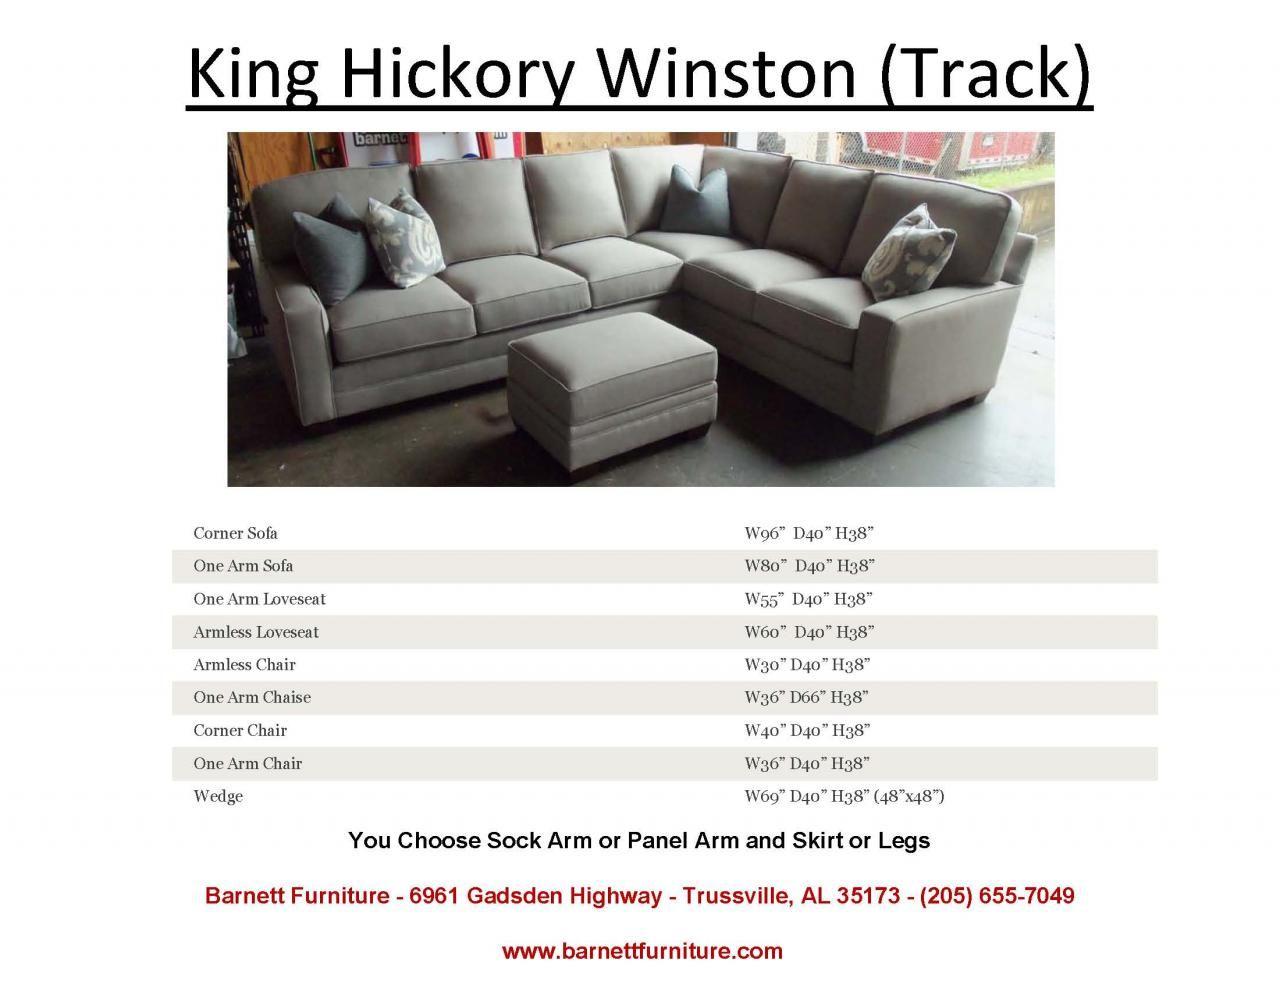 Pleasing King Hickory Winston Sectional Track Arm And Modern Leg Inzonedesignstudio Interior Chair Design Inzonedesignstudiocom